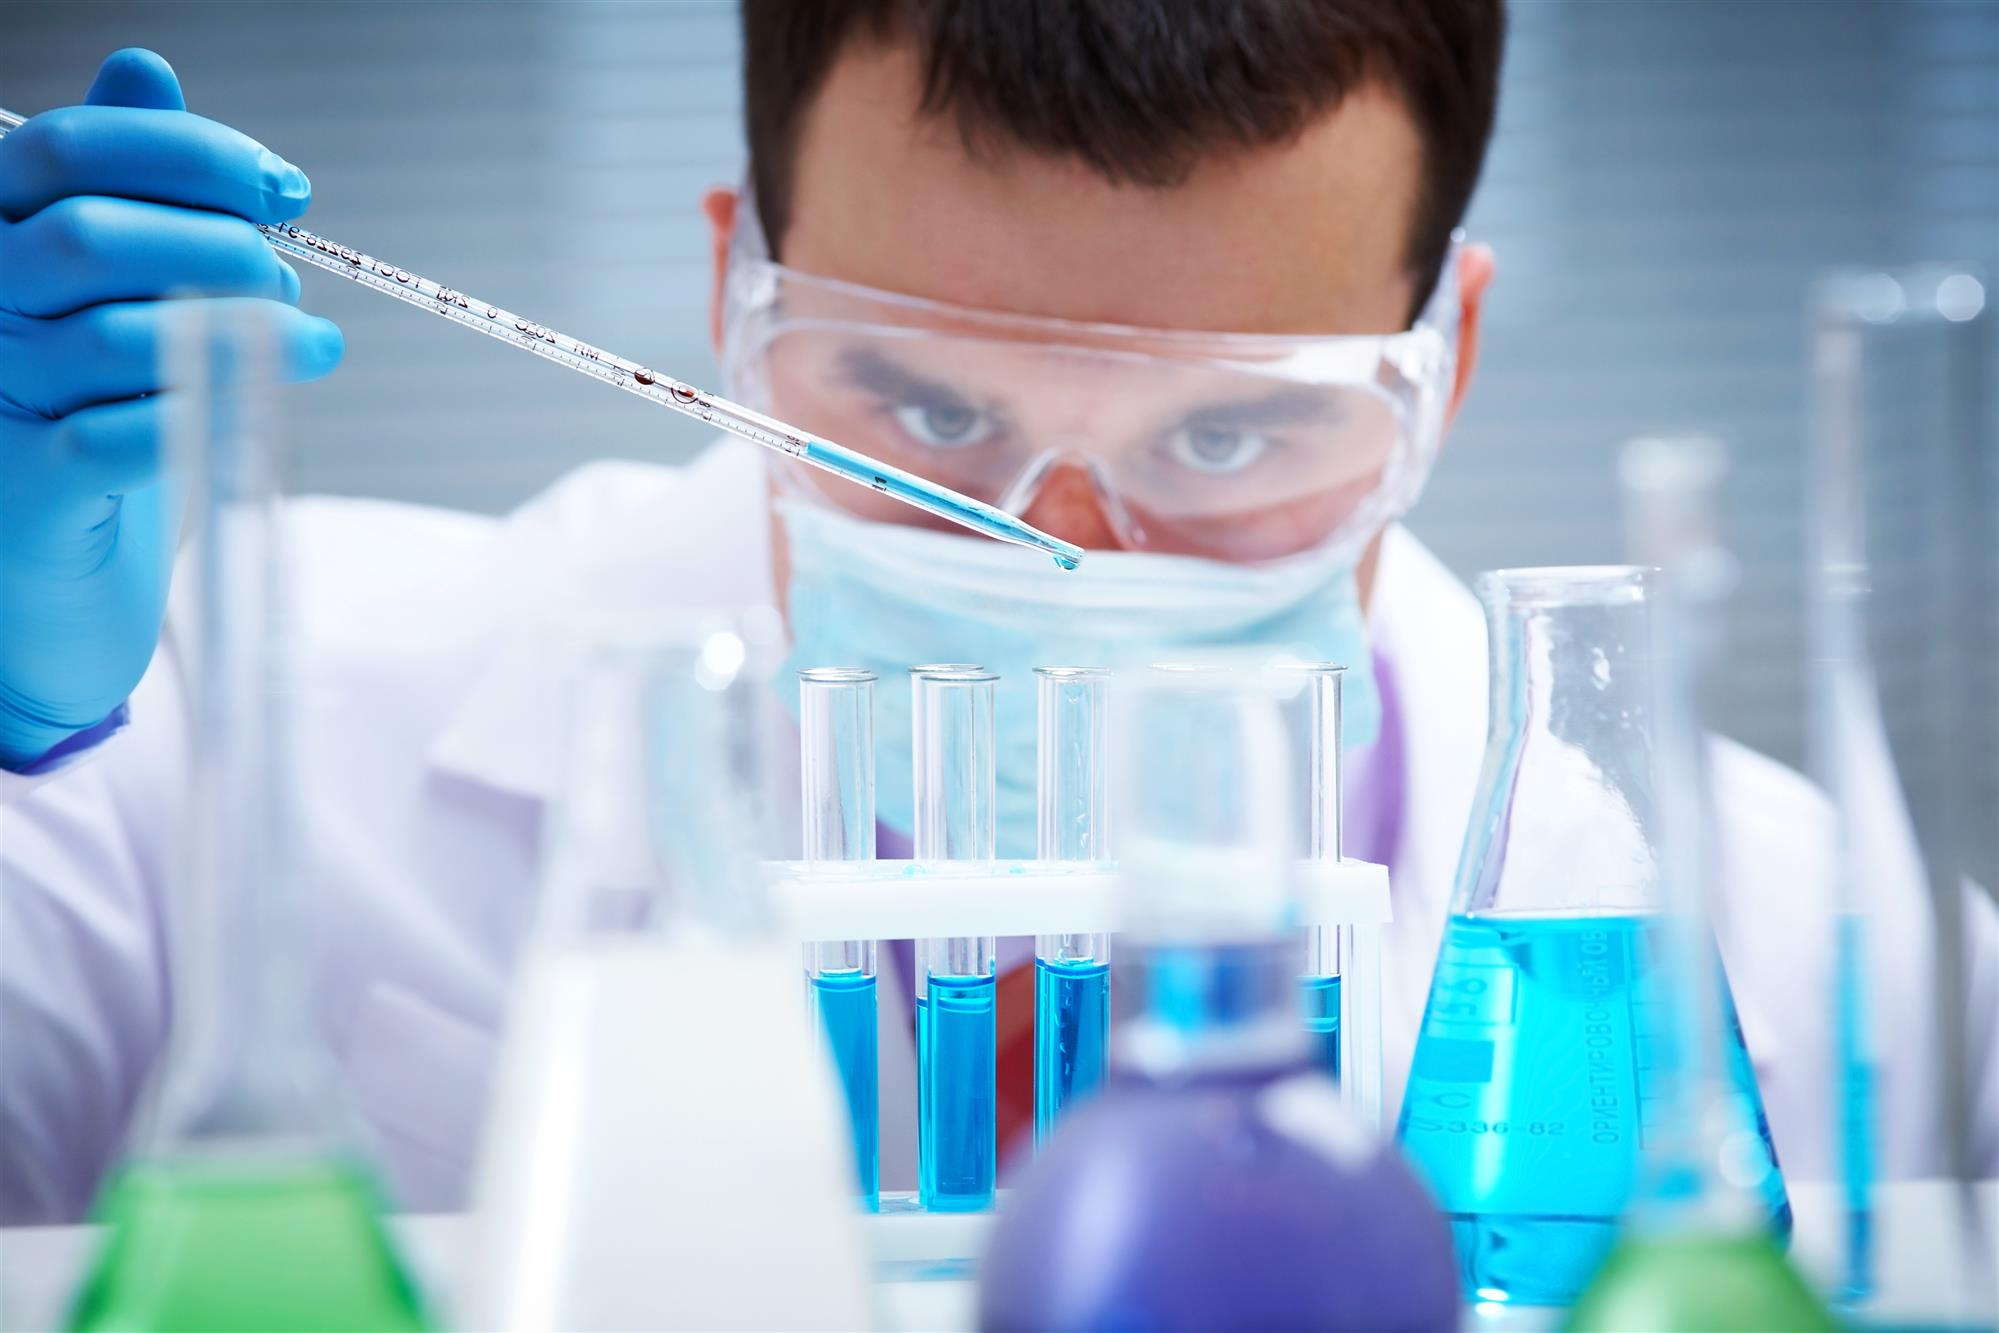 Laboratory-Notebook-Practices